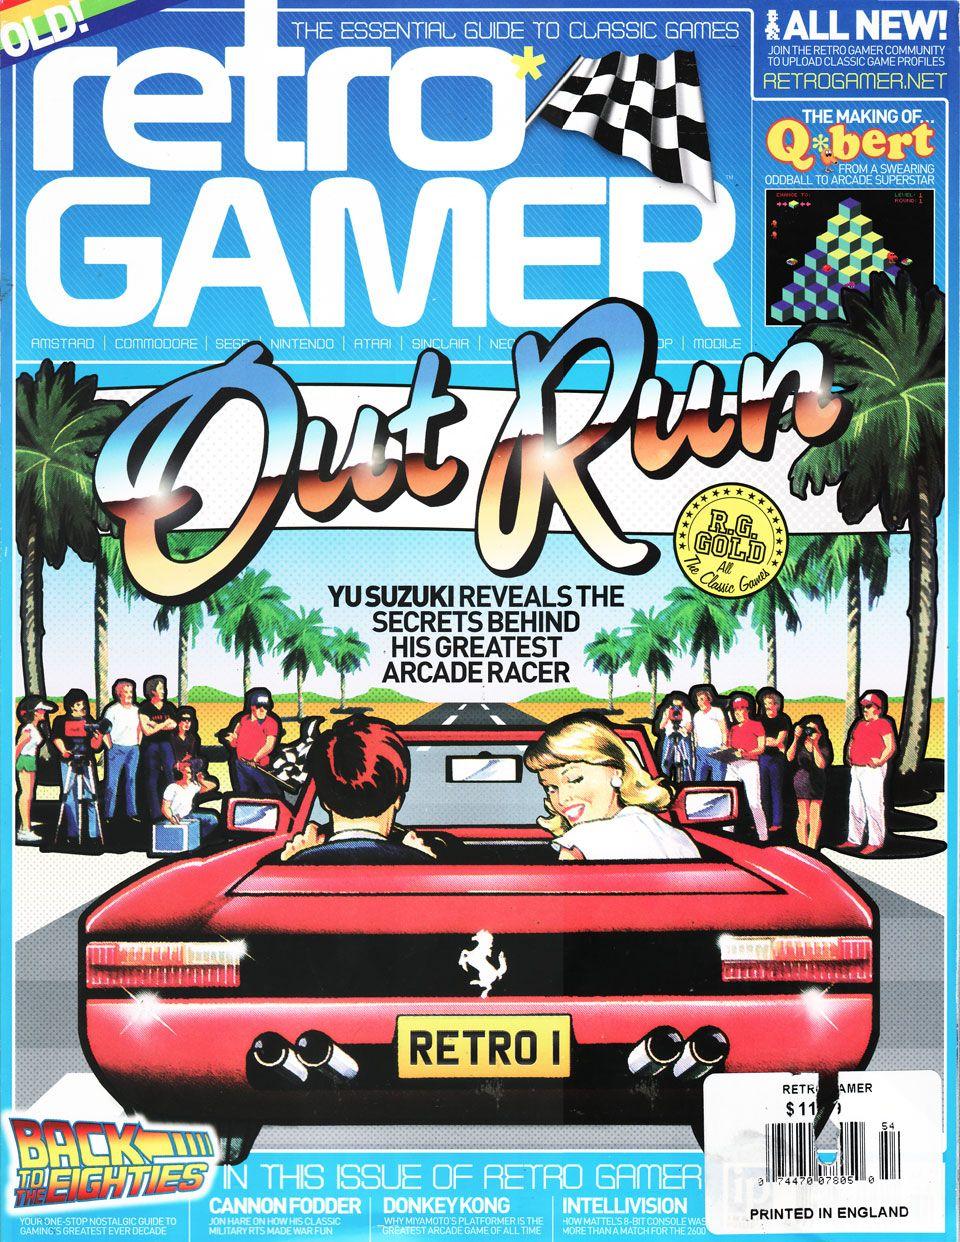 Retro Gamer magazine OutRun cover http//www